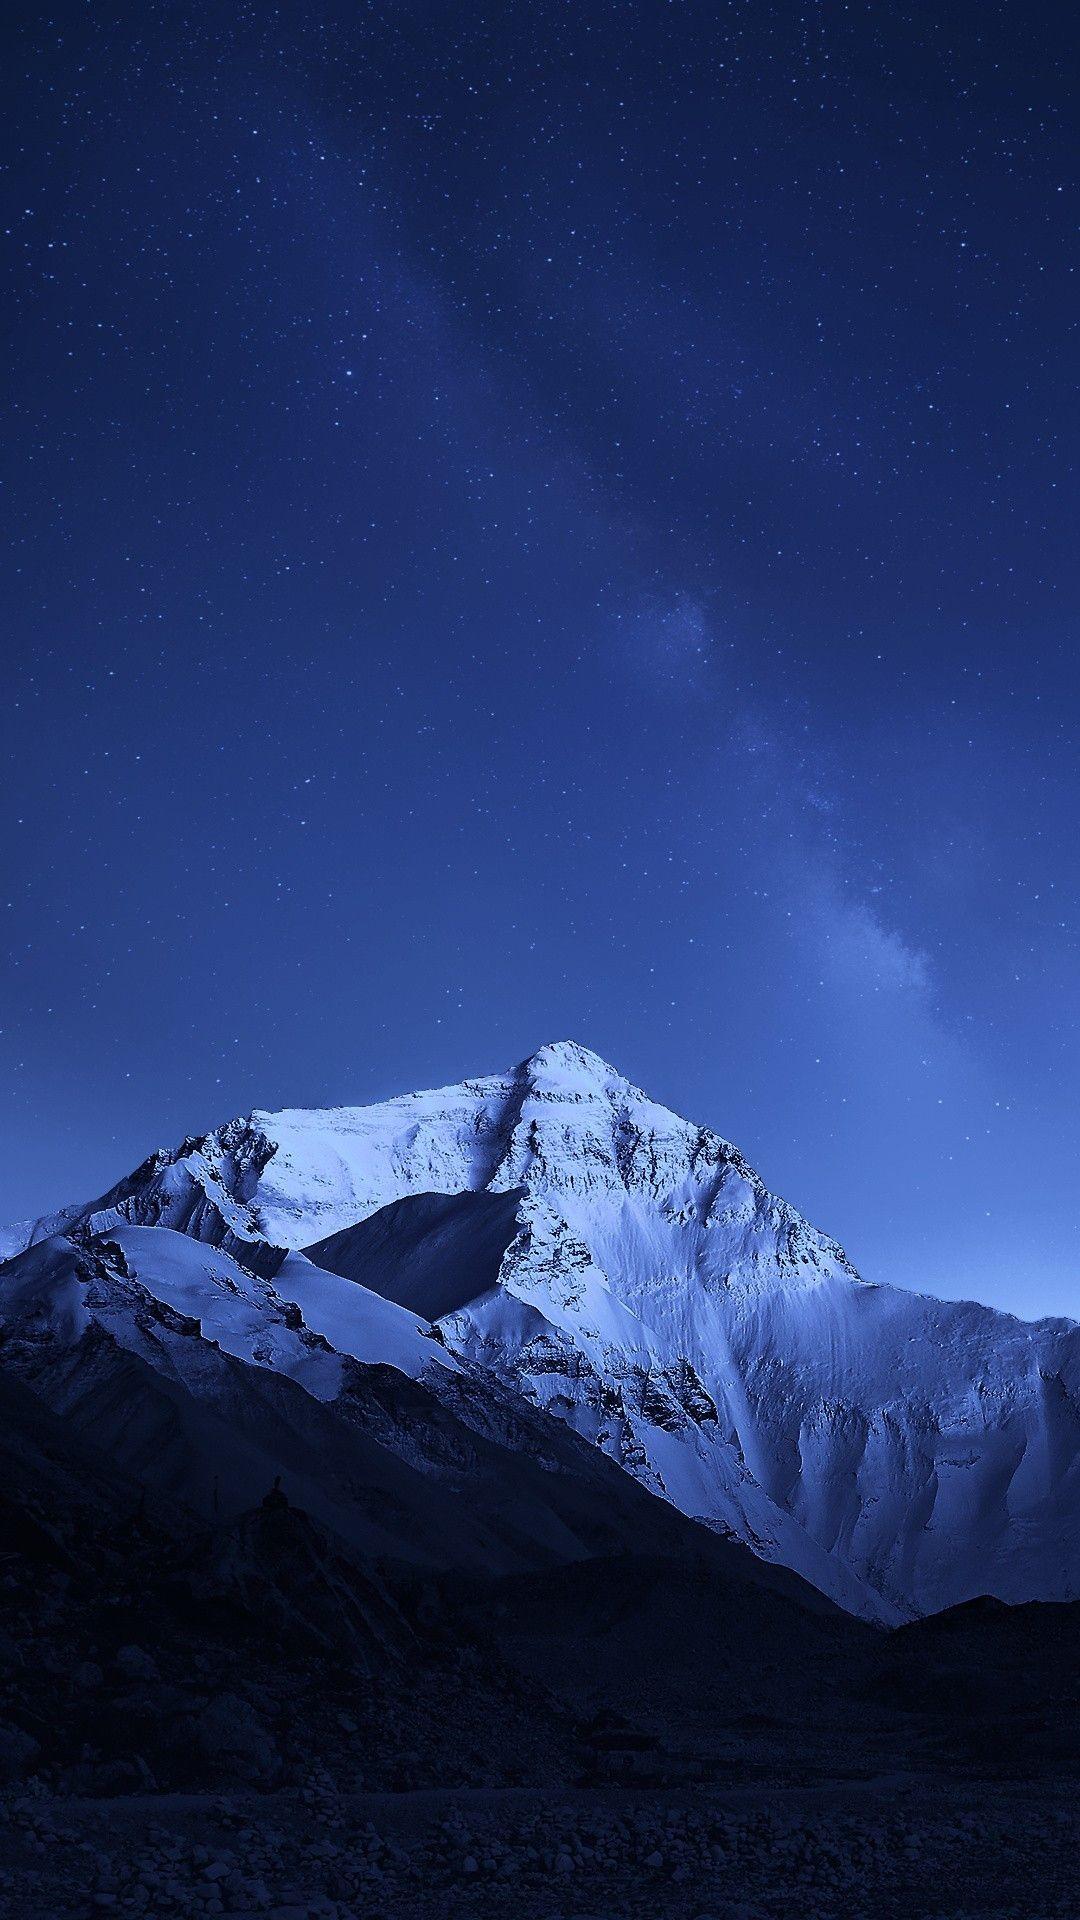 Res: 1080x1920, #glacier Wallpaper Pc, Wallpaper Backgrounds, Nature Wallpaper, Mountain  Landscape, Nature Photography